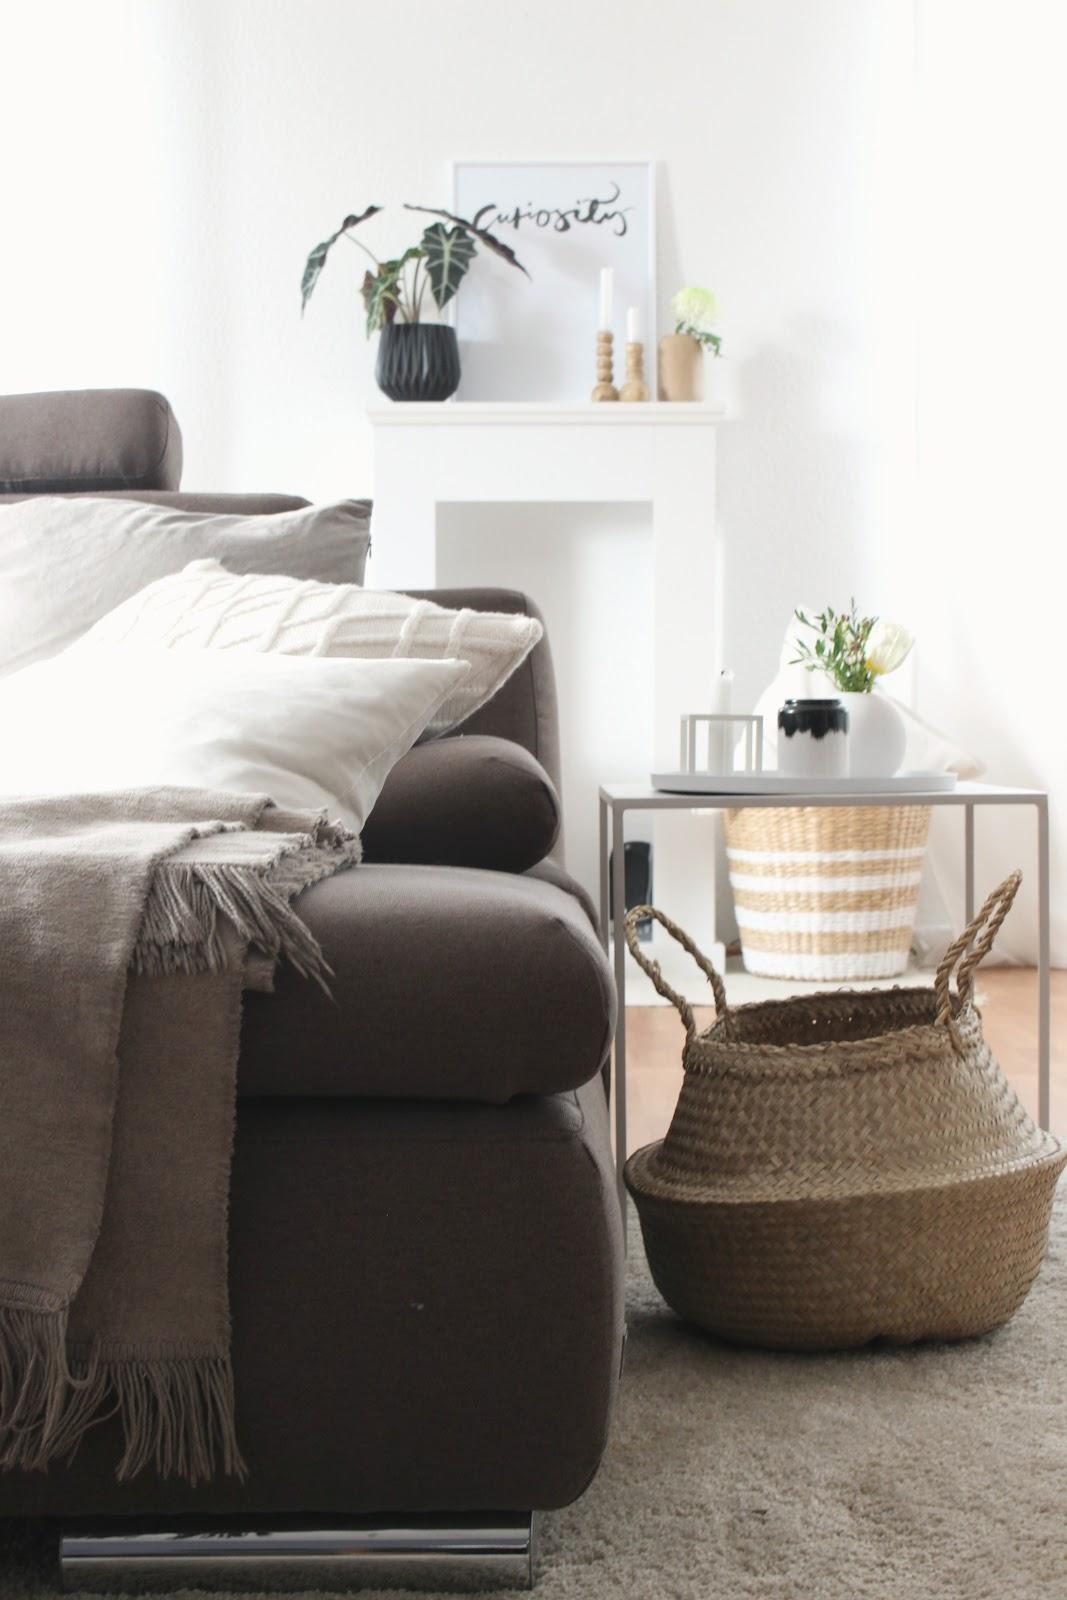 himmelsst ck interior und lifestyle blog interior wohnzimmer update in modernem. Black Bedroom Furniture Sets. Home Design Ideas